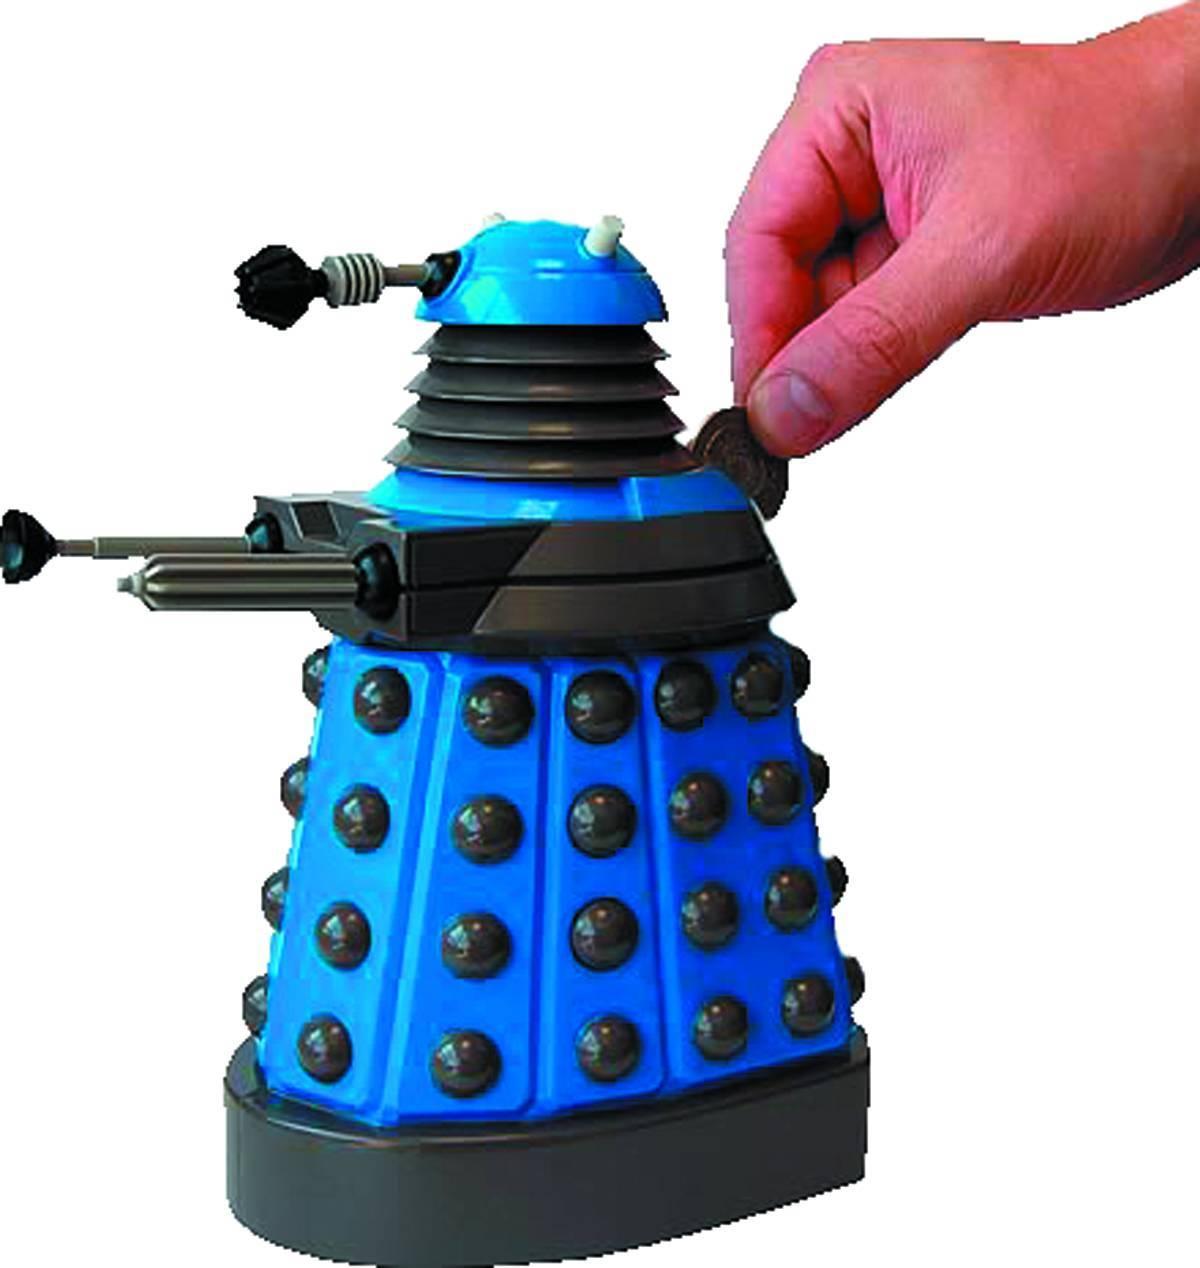 Doctor Who Dalek Talking Money Bank